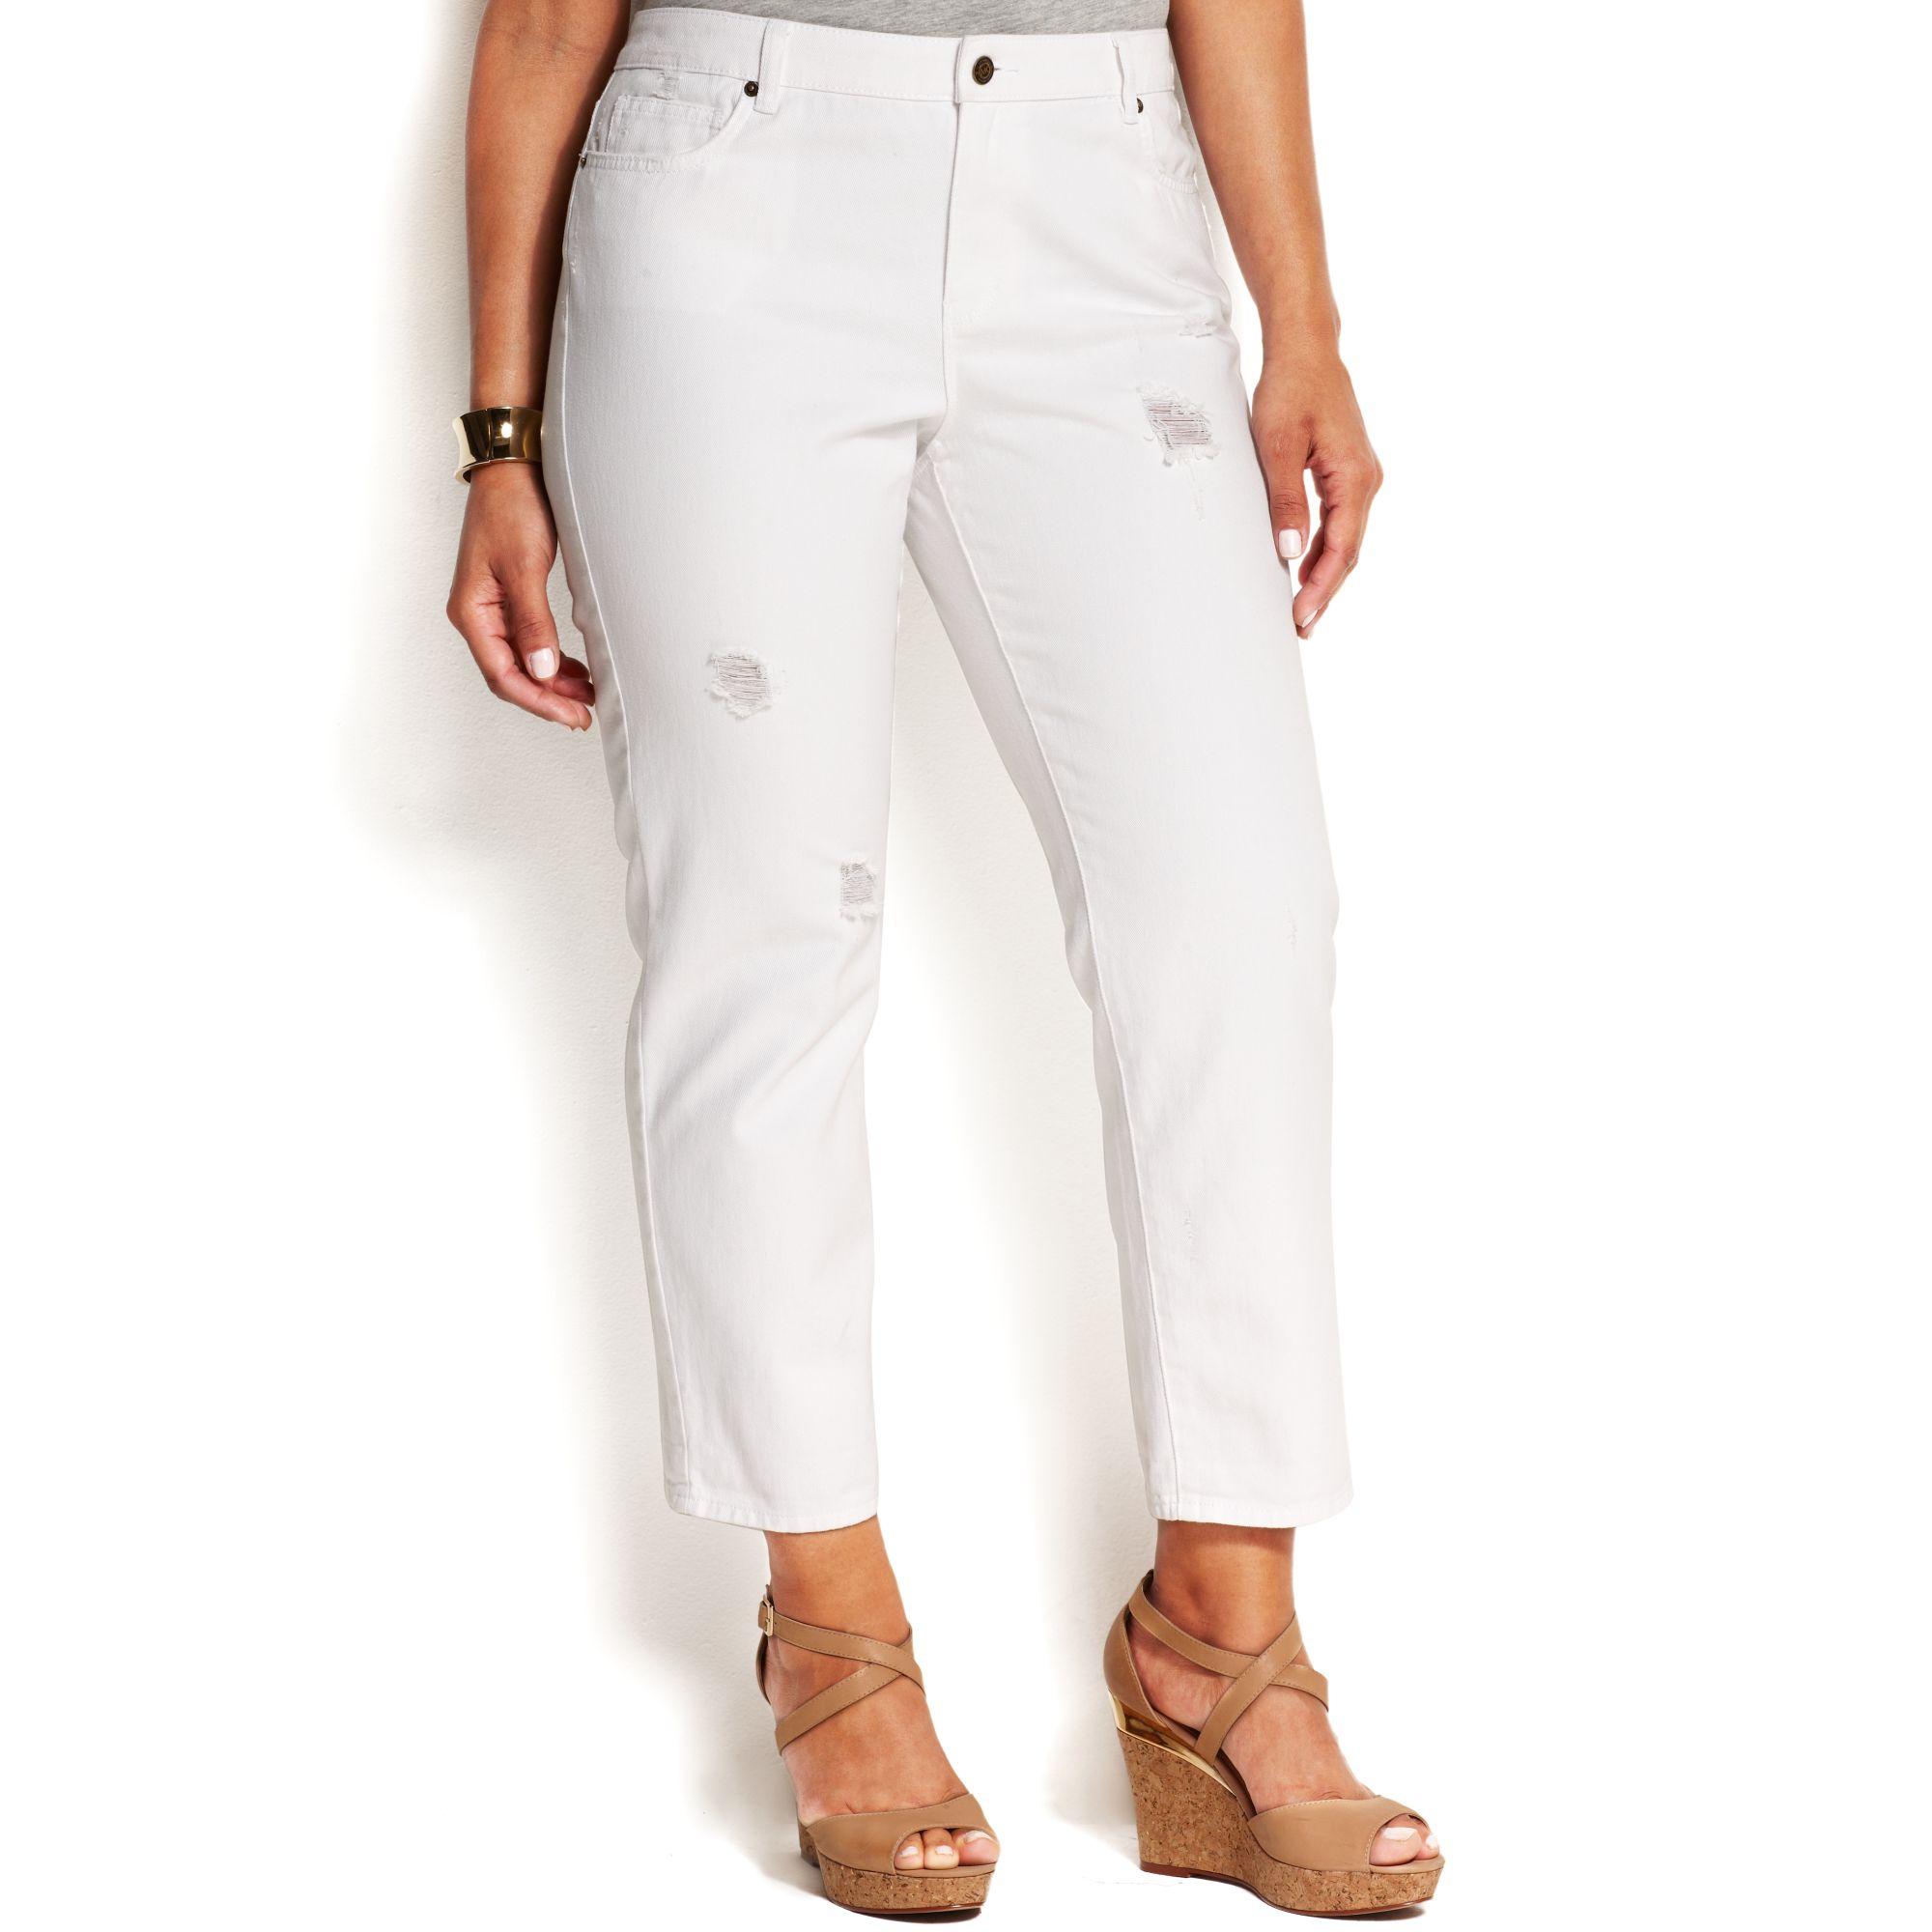 a88eead1577 Lyst - Michael Kors Michael Plus Size Cropped Boyfriend Jeans in White